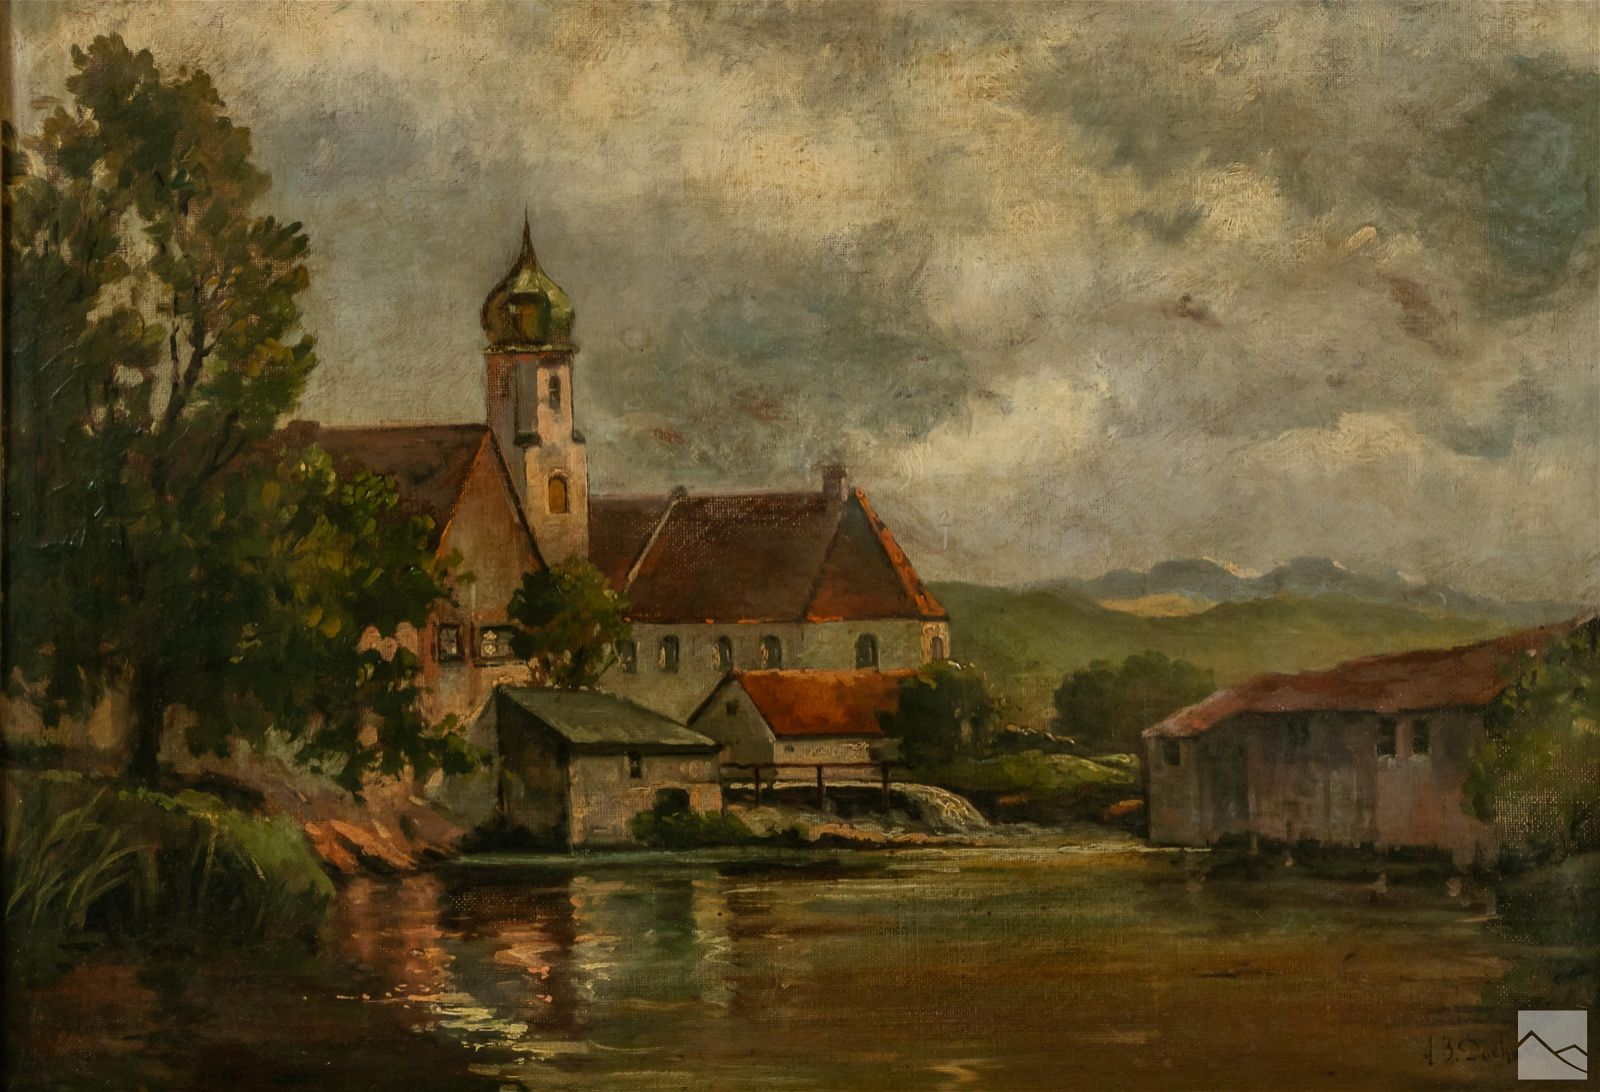 Alexander B. Docharty 1862-1940 Landscape Painting